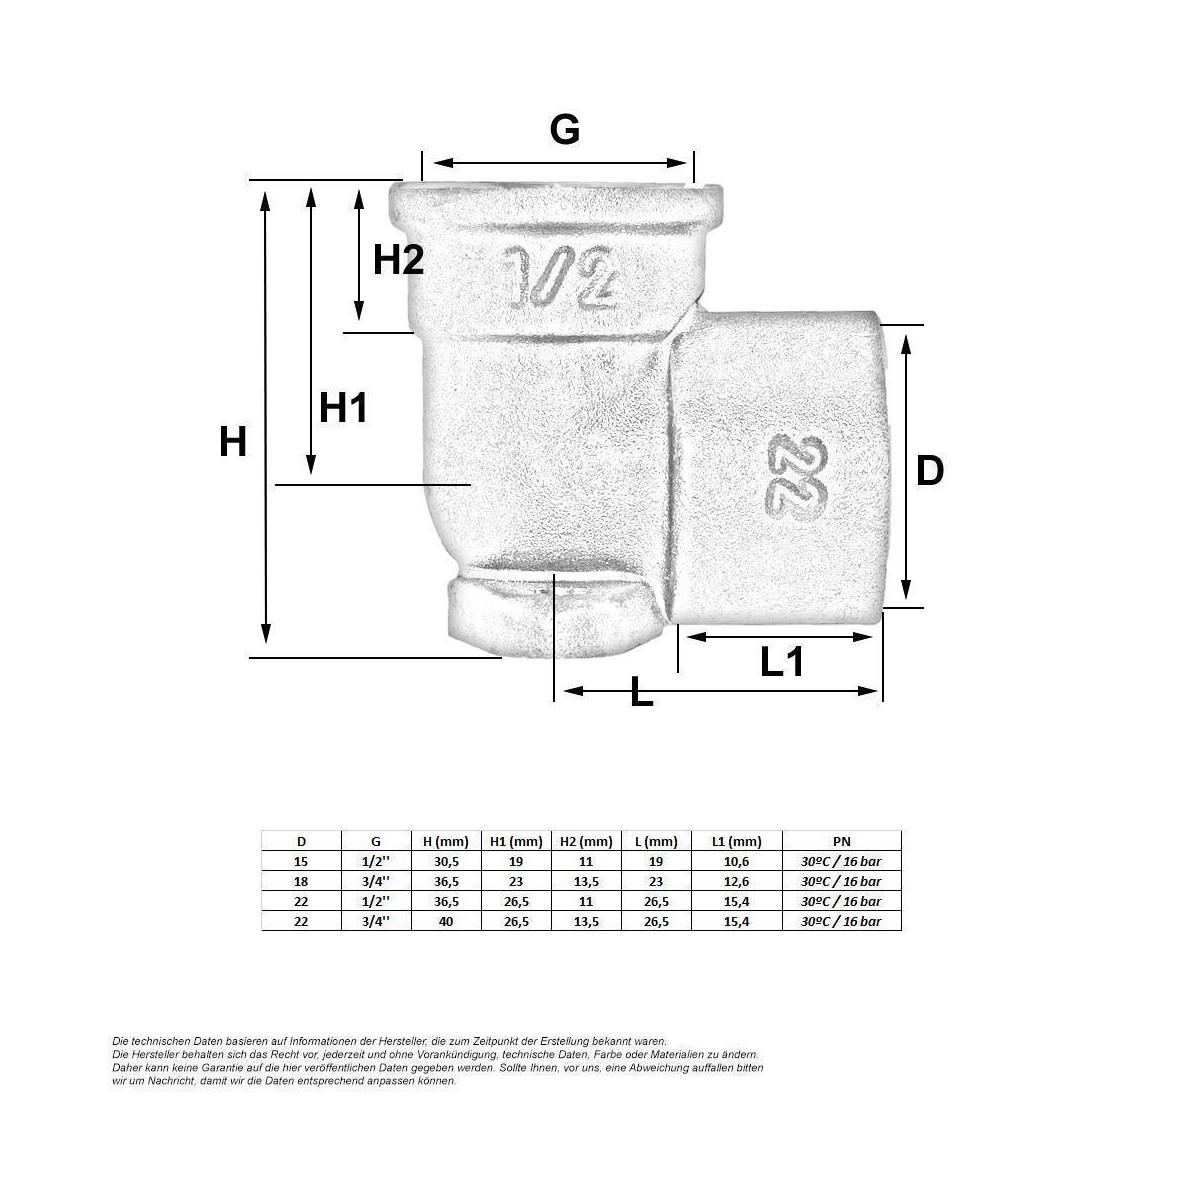 l tfitting wandscheibe 15 mm x 1 2 zoll 1 70 eu. Black Bedroom Furniture Sets. Home Design Ideas